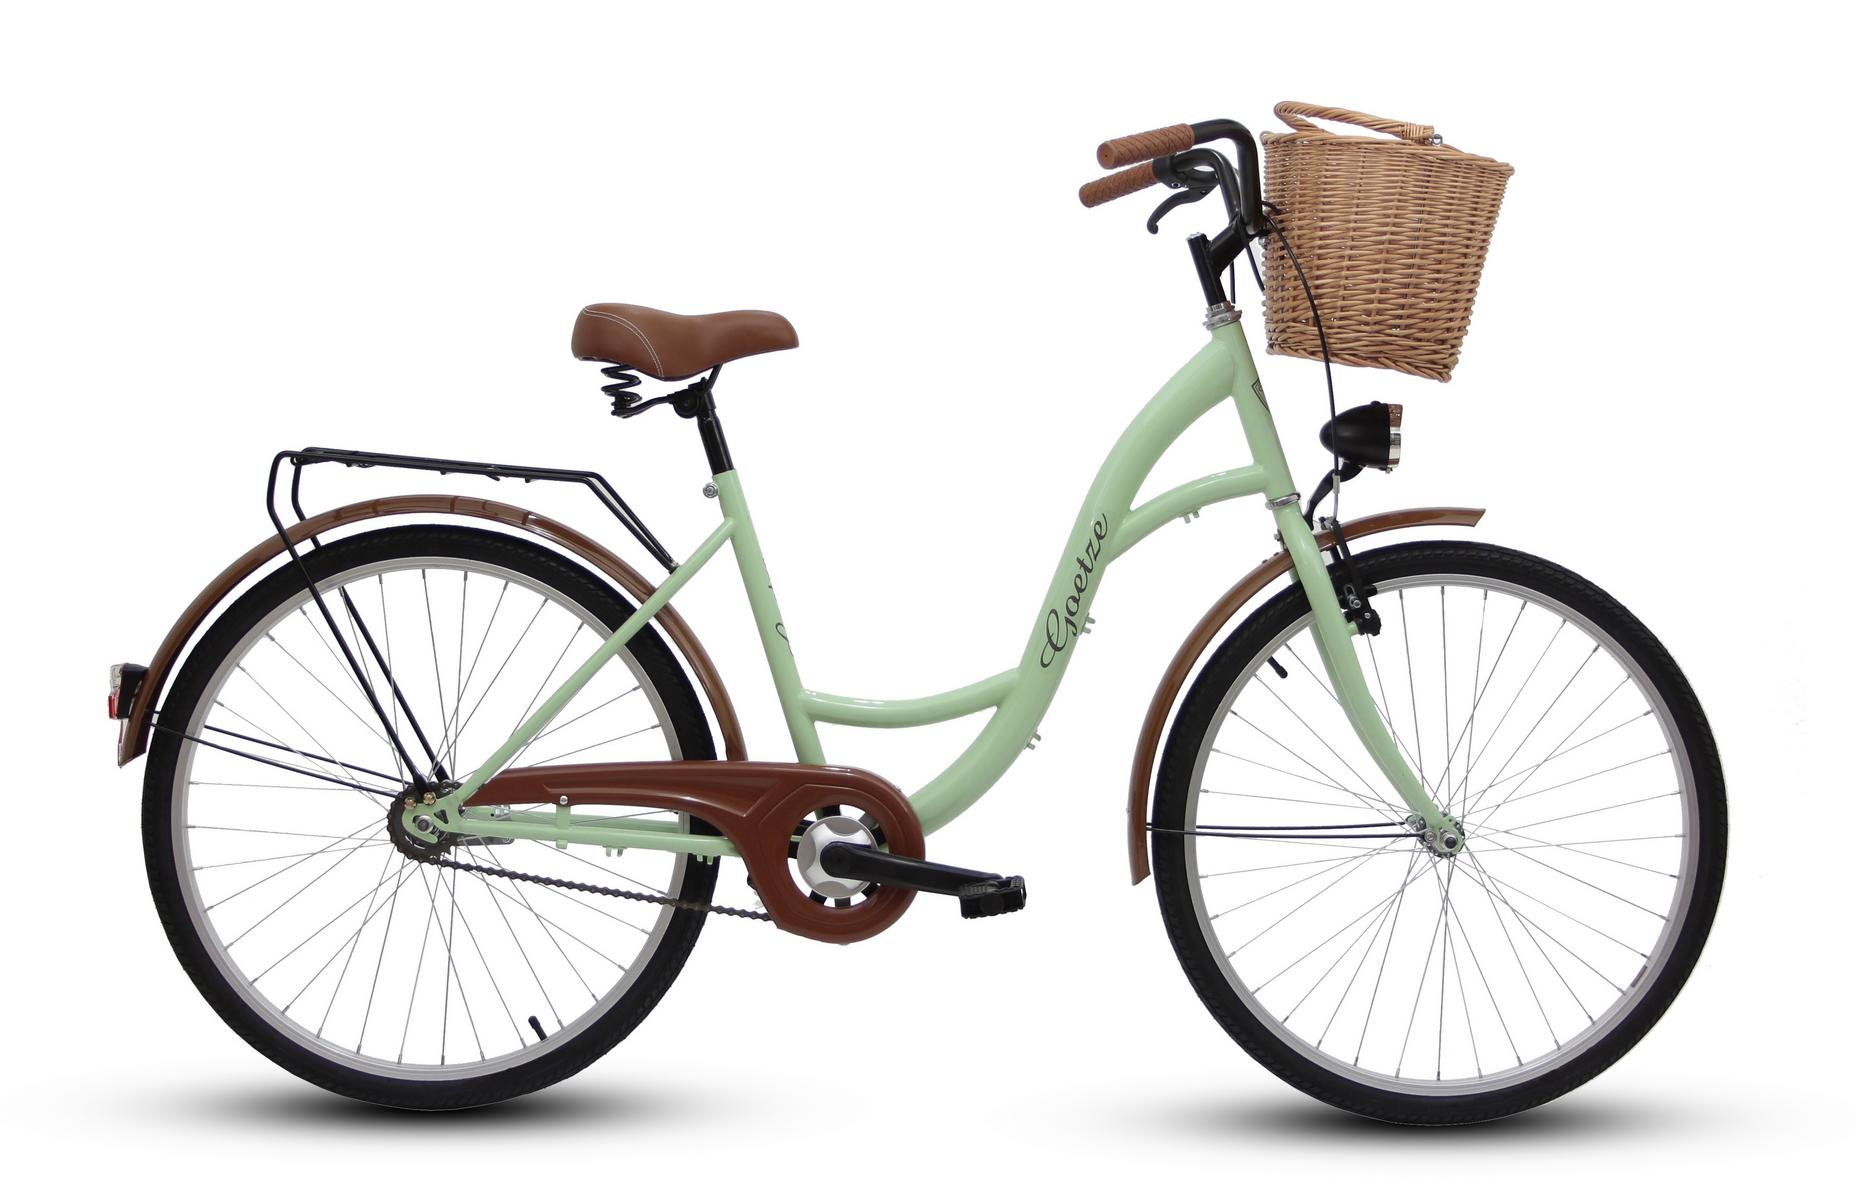 "Dámsky mestský bicykel GOETZE 26 eco lady + košík !!!  Veľkosť kolies ("") 26"